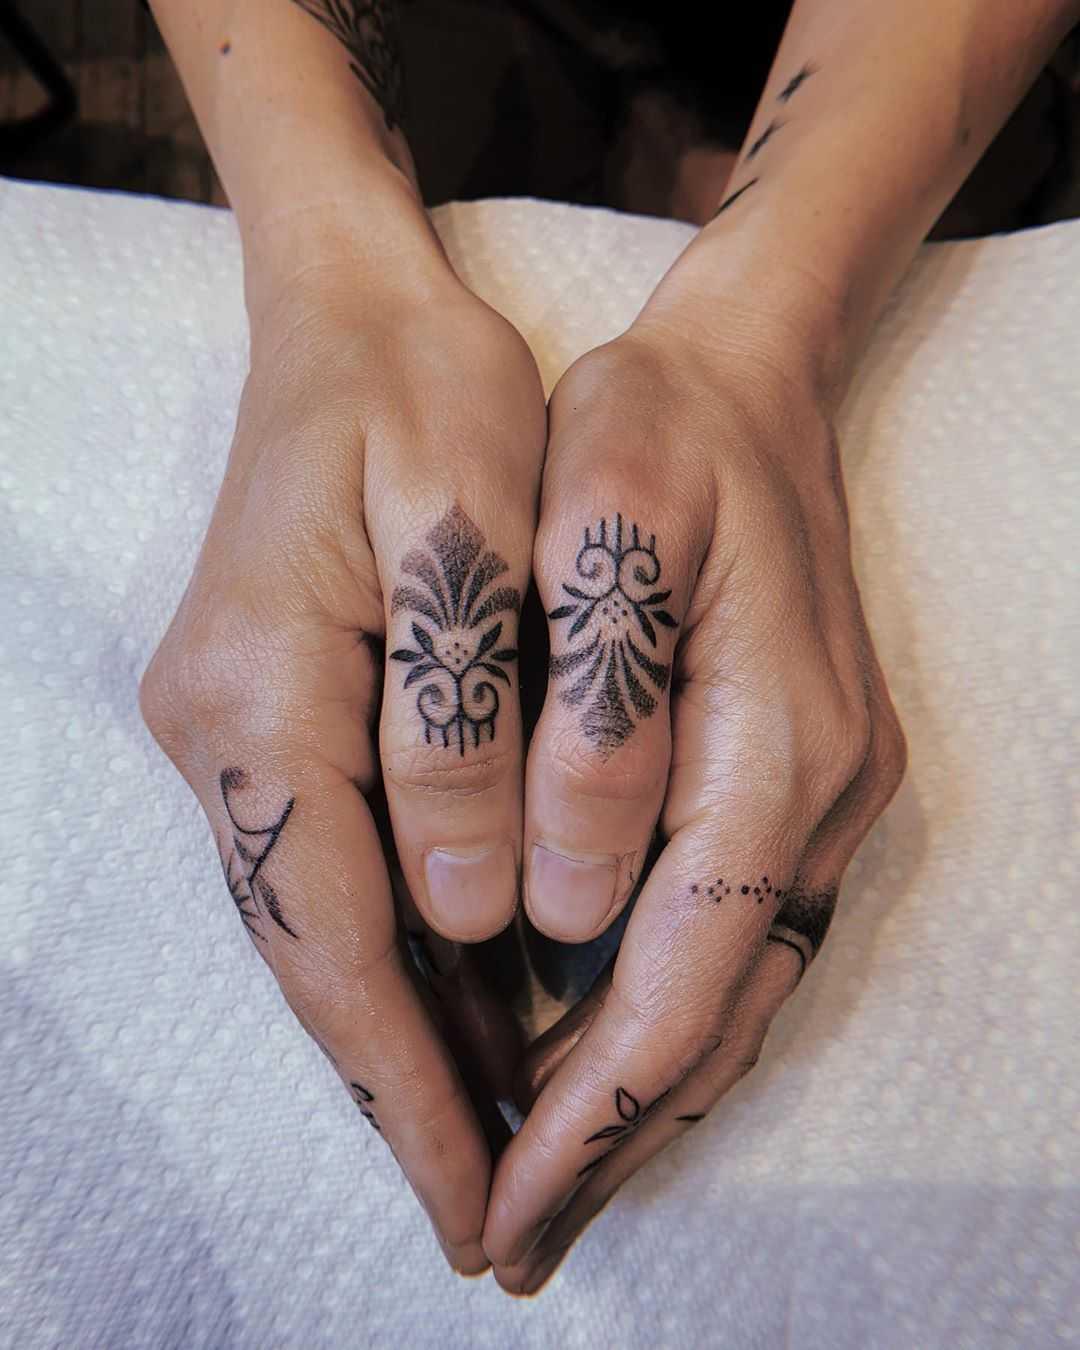 Energy exchange tattoo by Belladona Hurricane